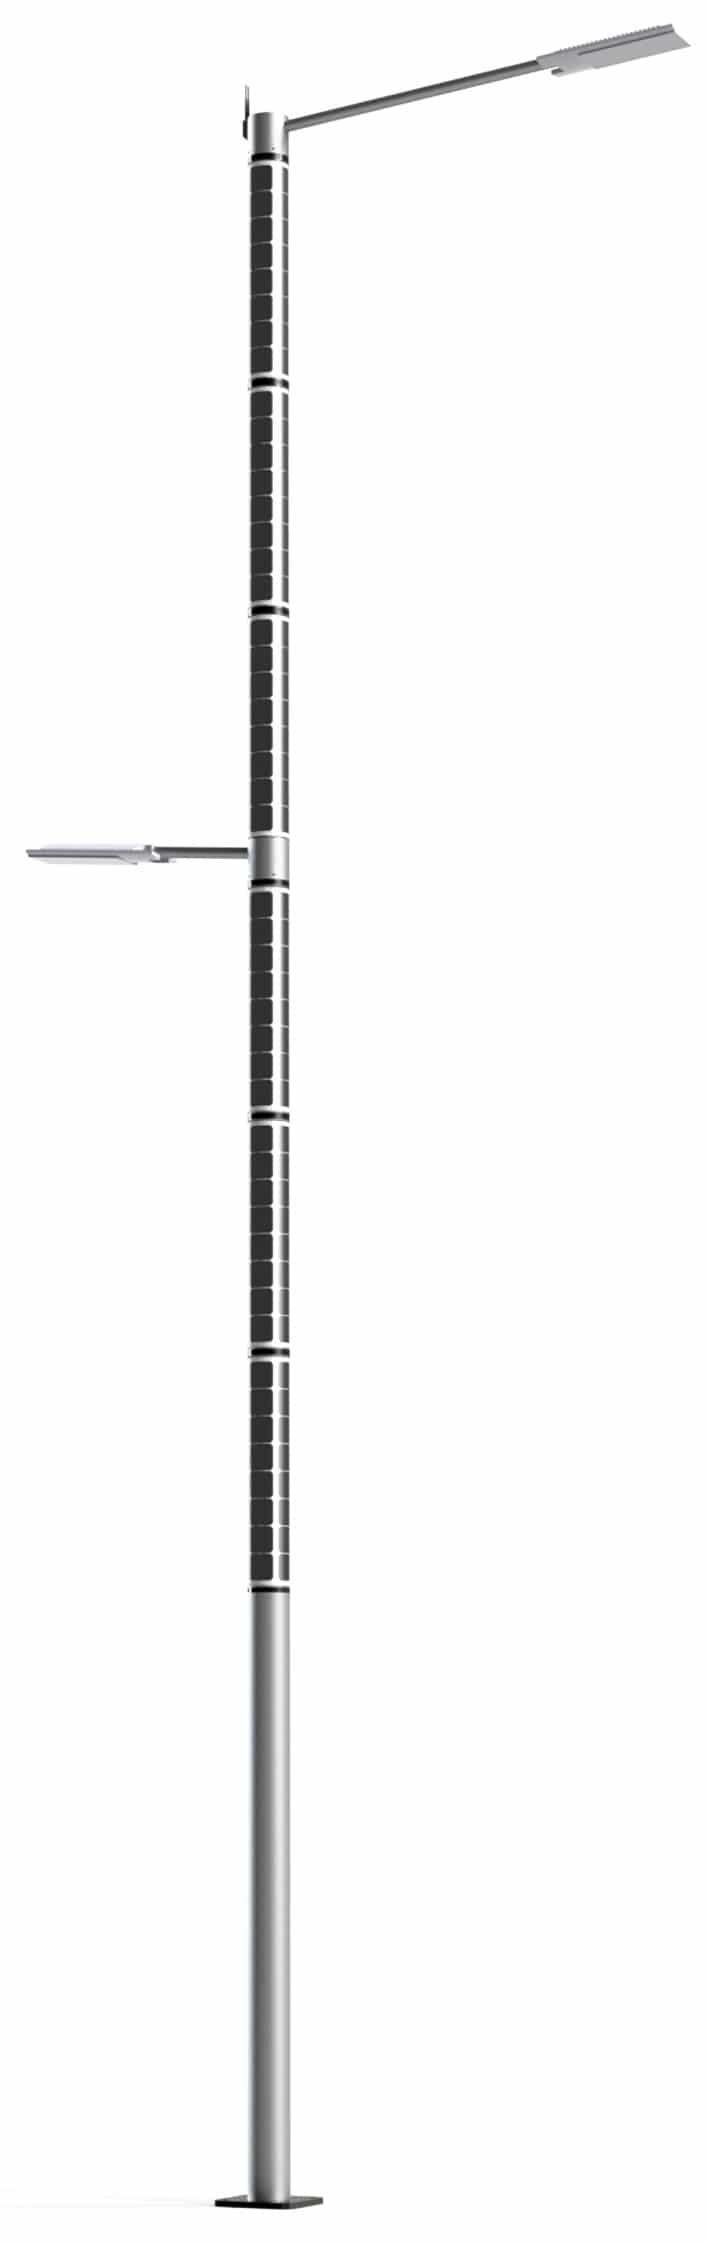 Solar light pole solar panel powered street light post